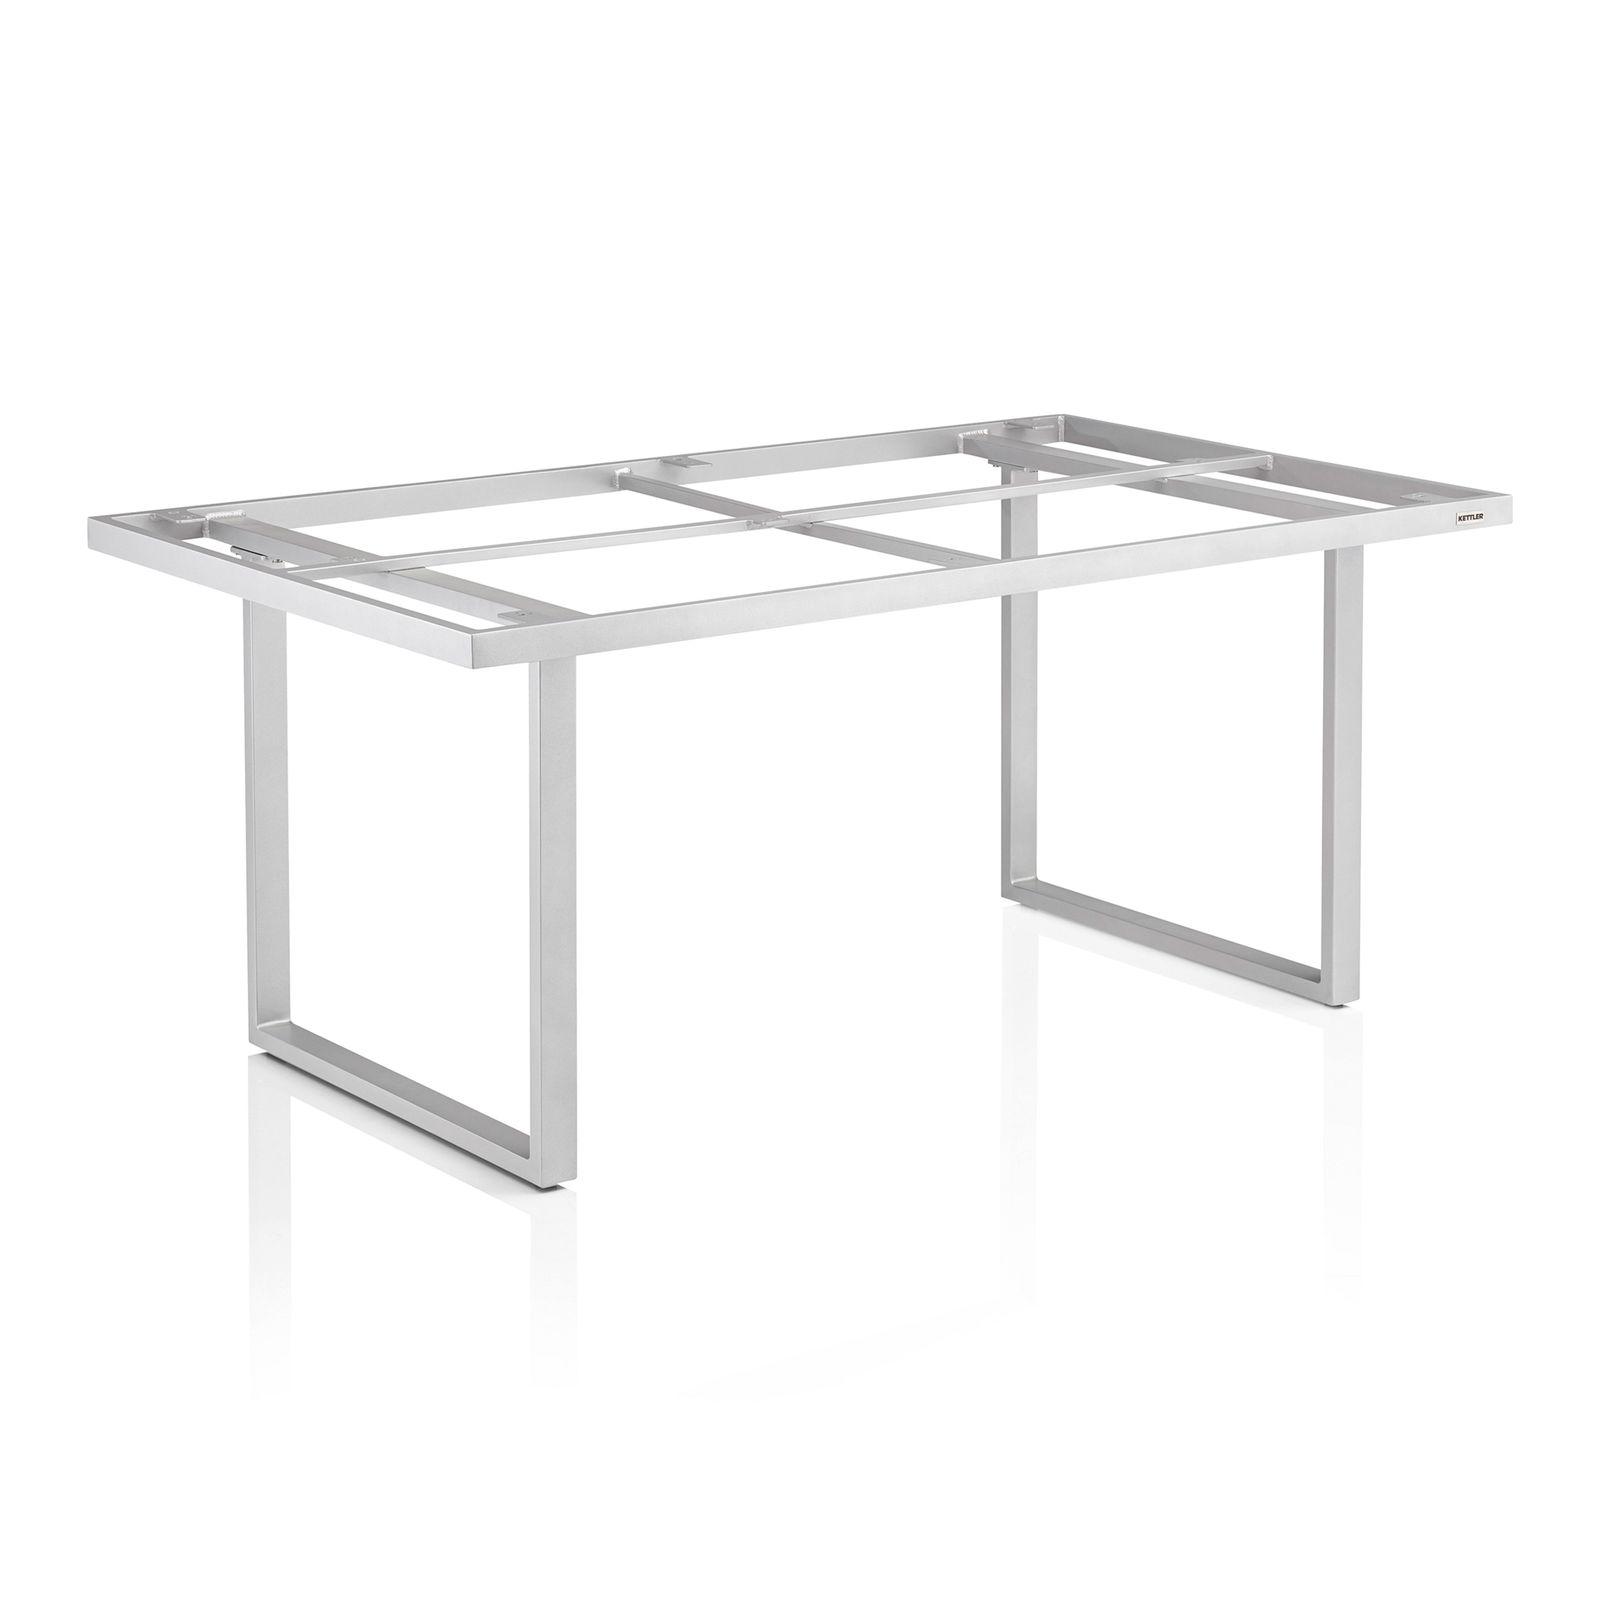 Stelaż stołu Ego Modular Dining 160 x 95 x 68 cm srebrny / stal KETTLER